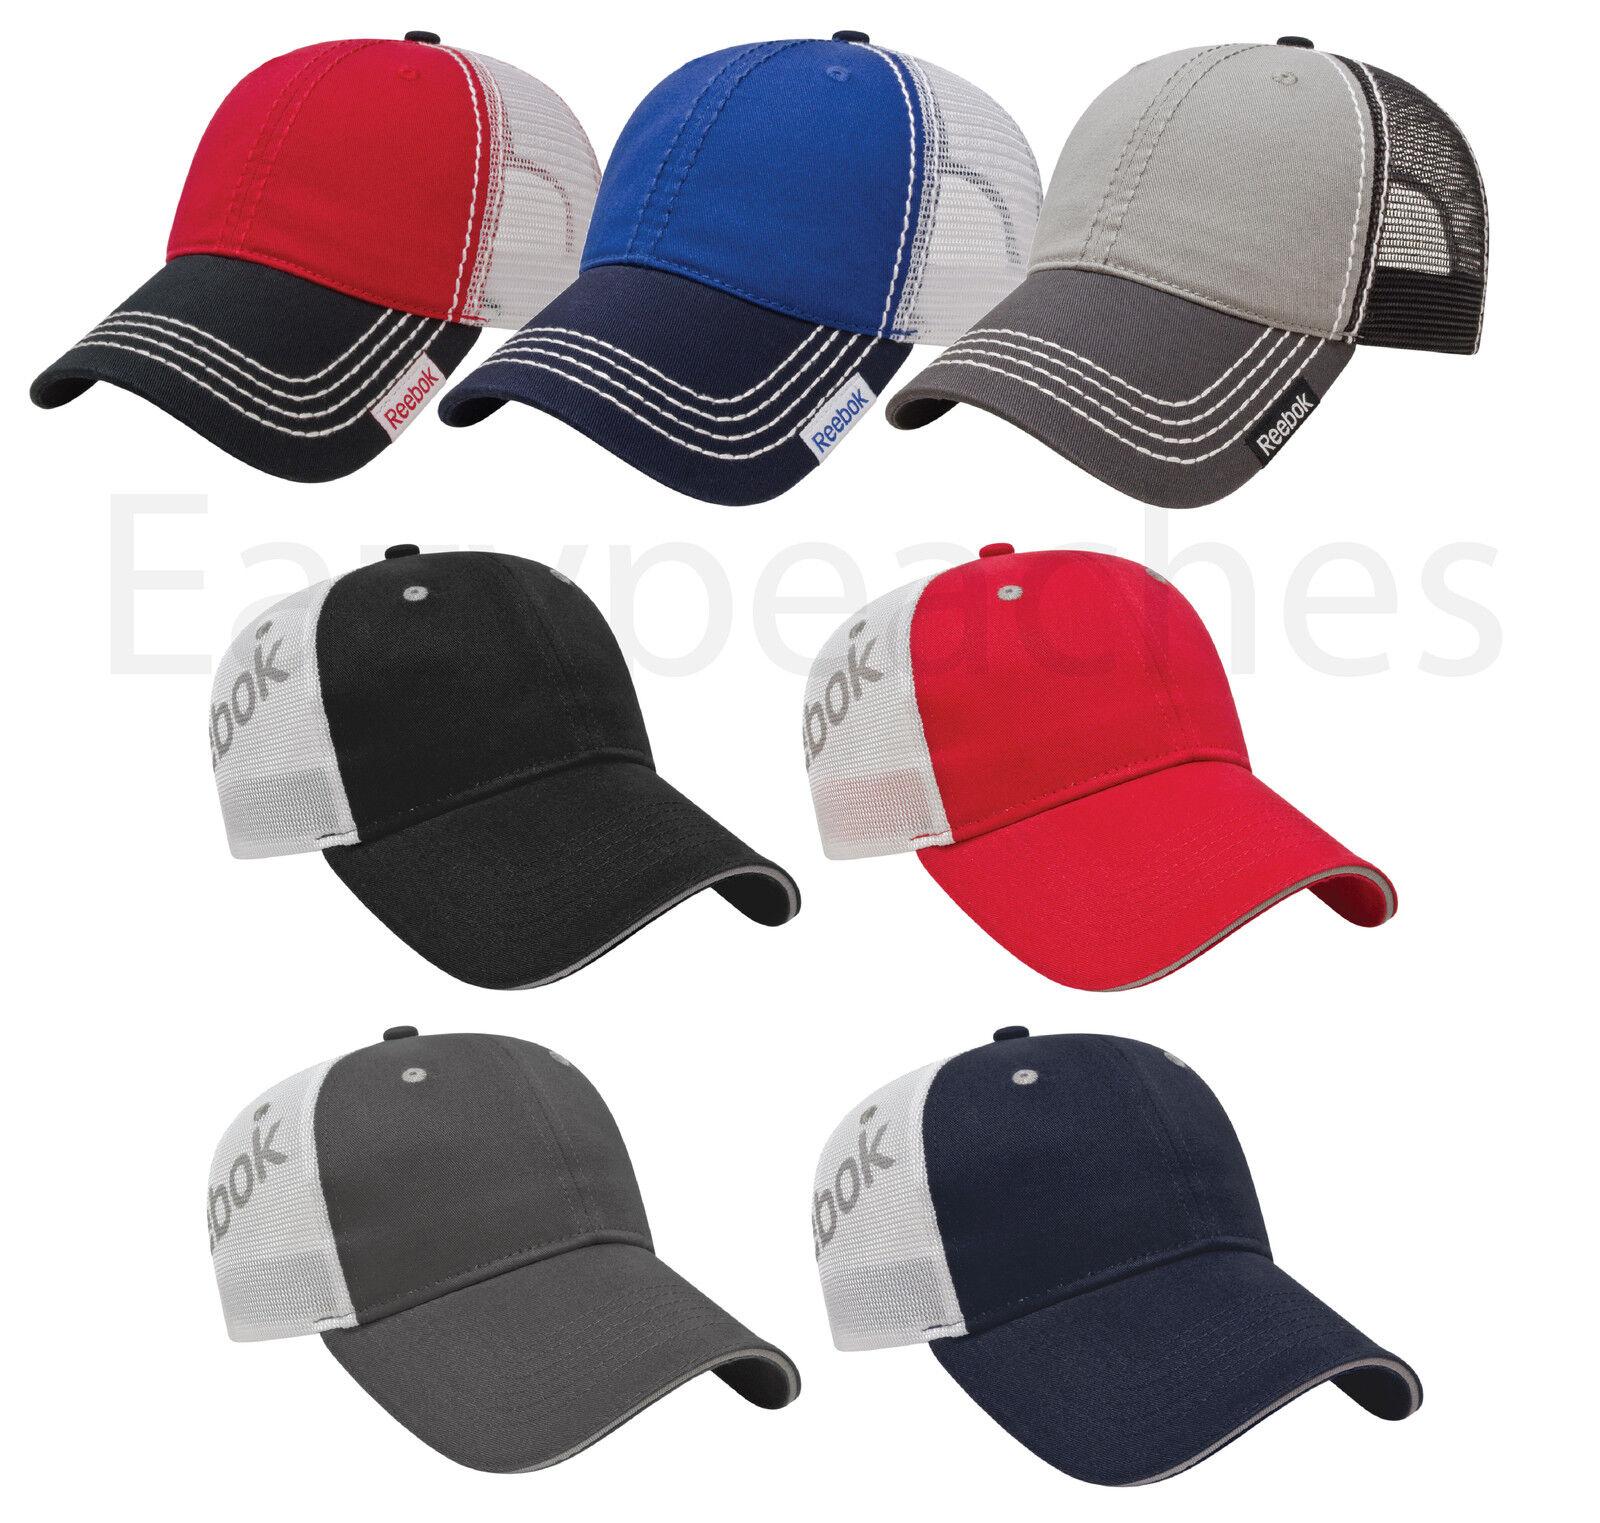 a5491f7bc86 Details about REEBOK - UNISEX Golf TRUCKER CAP